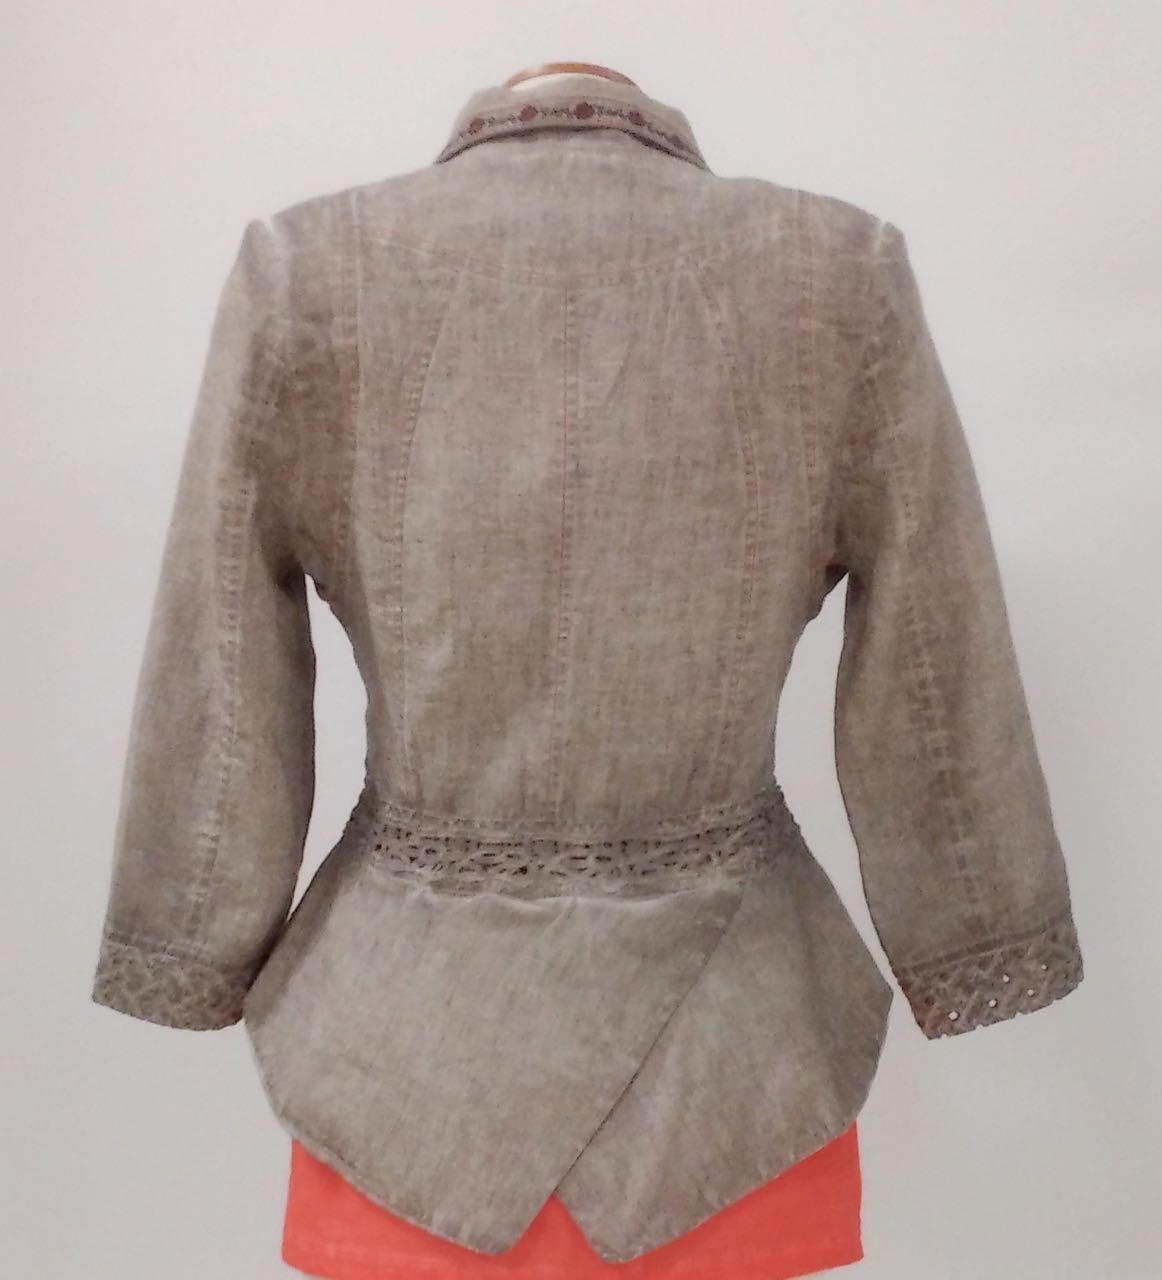 ANVRDIE Linen Jackets, Canada US